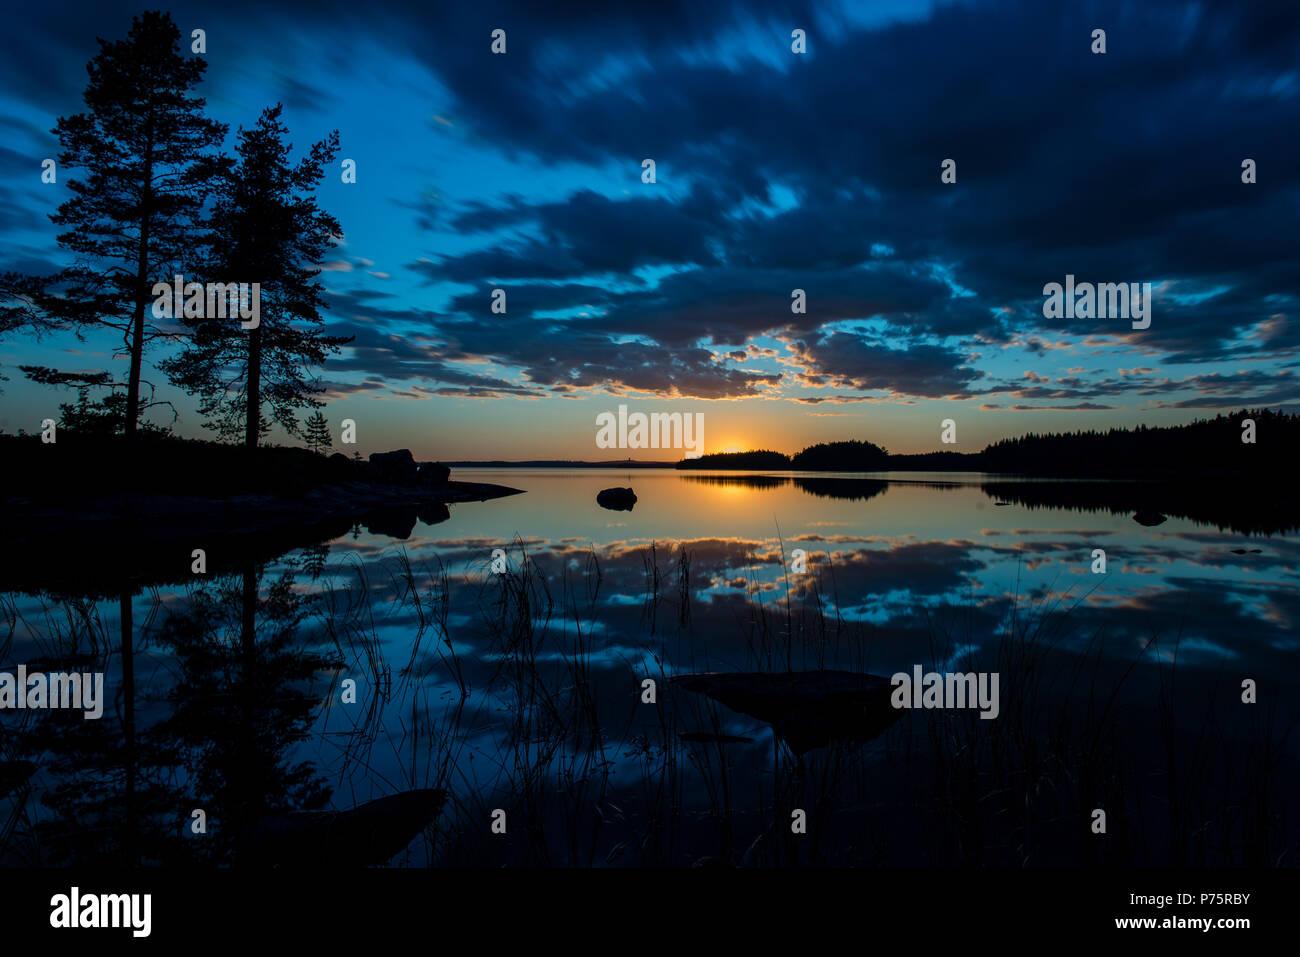 Bel Tramonto sul lago Yngen Immagini Stock